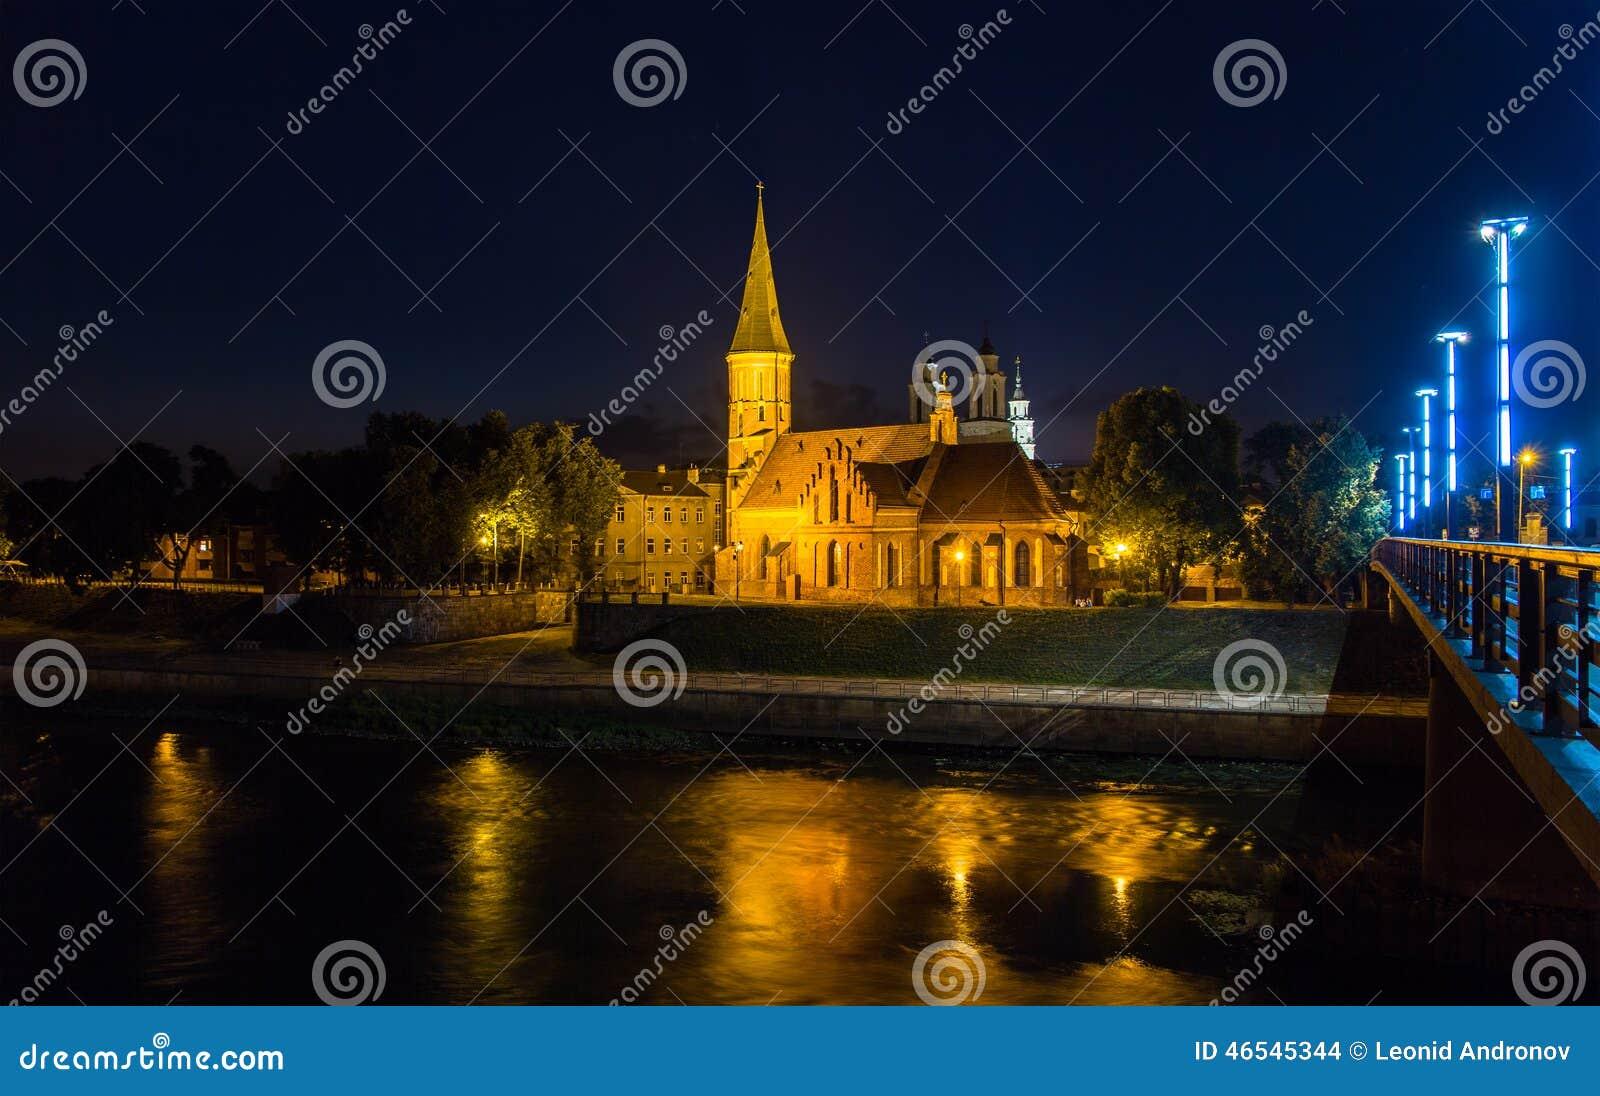 Vytautas  the Great Church in Kaunas